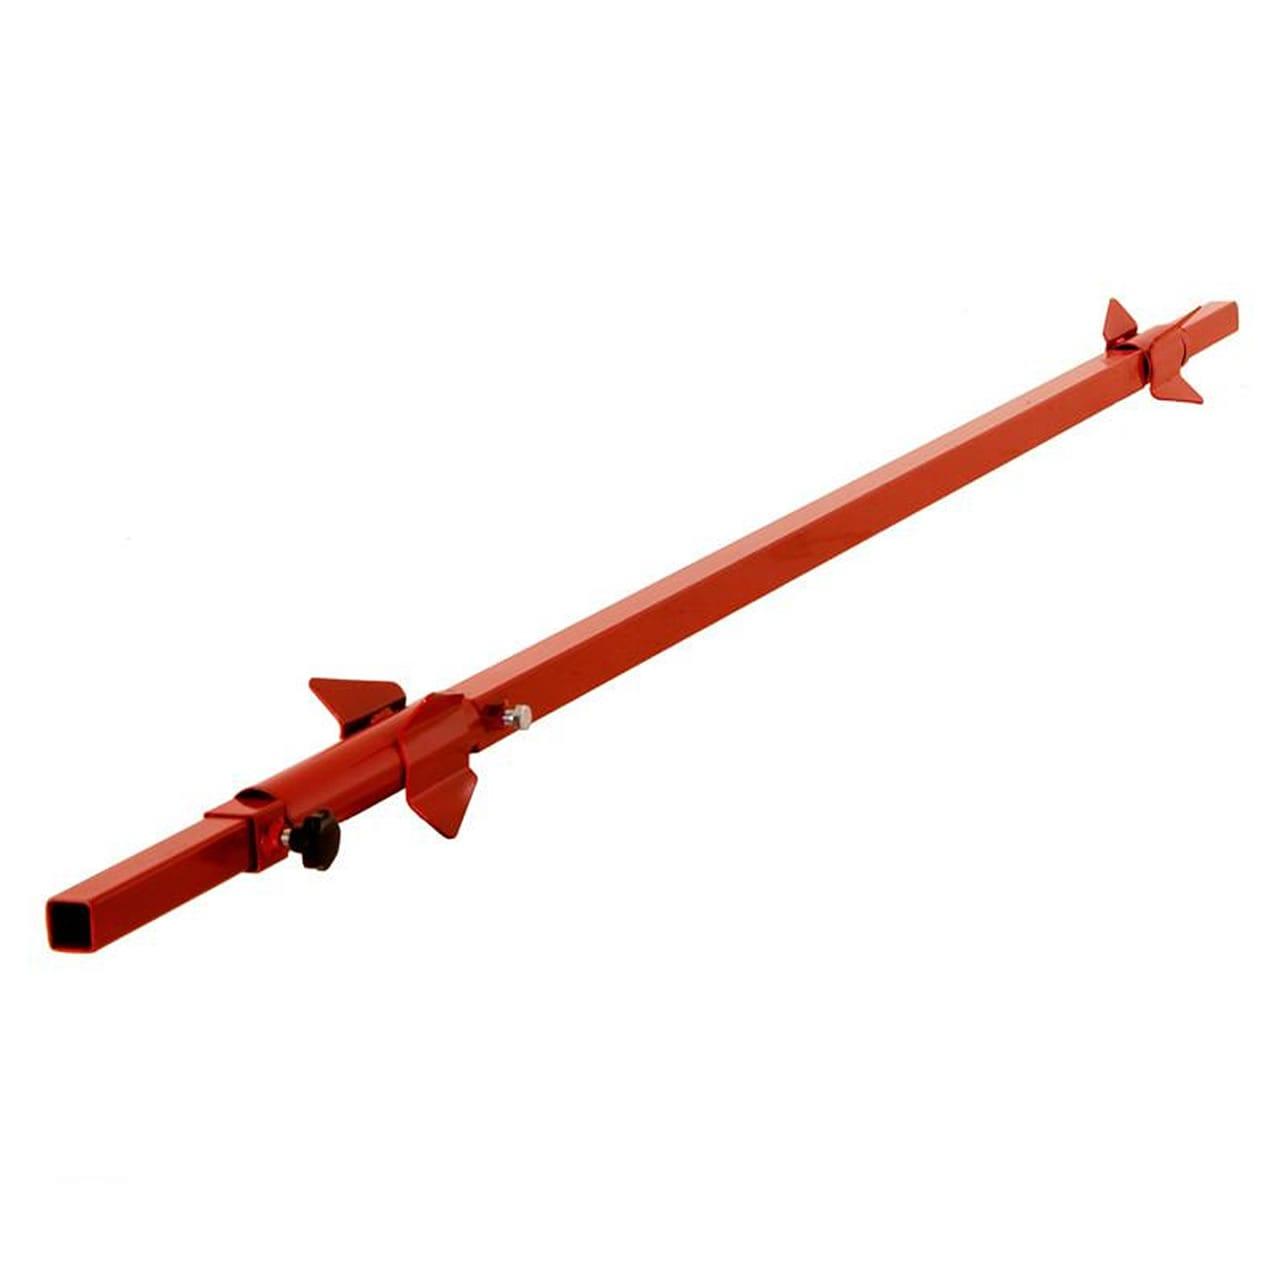 BC40ES Shrink-wrap roll stand additional Bar